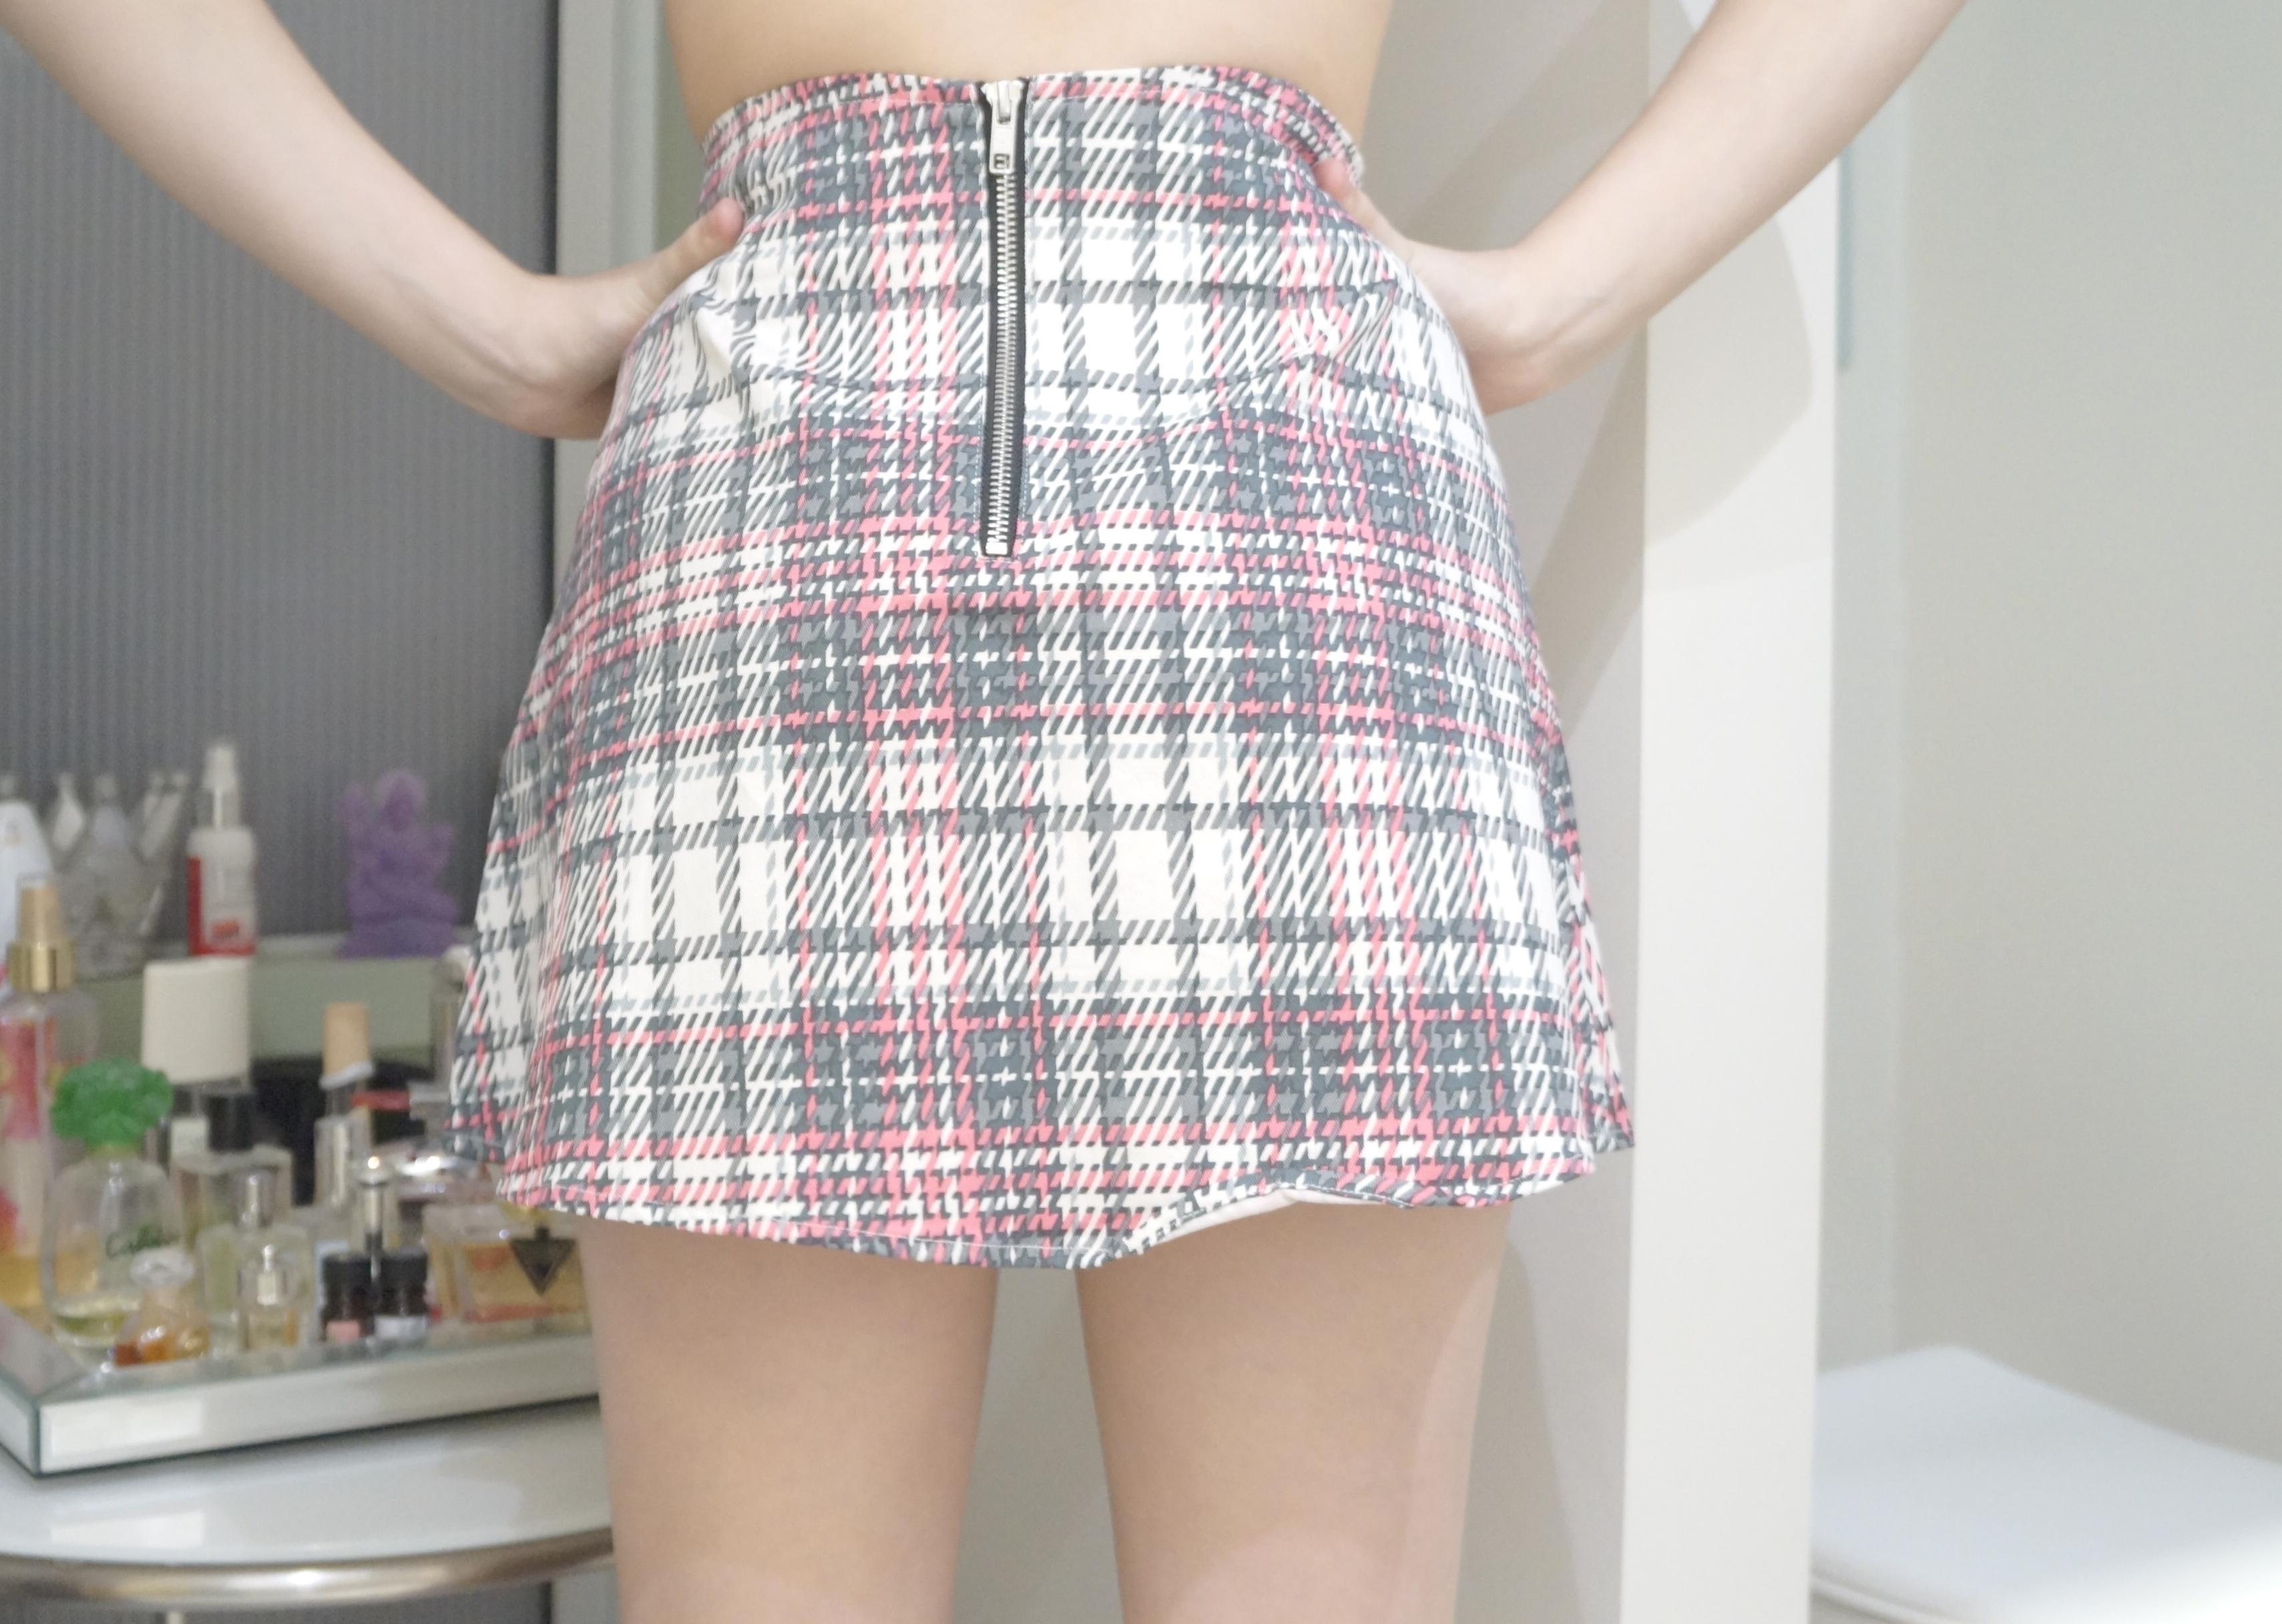 cc86e917ee Nasty Gal Motel Rocks Pink Grey White Plaid Tartan A-line Skirt S -  Thumbnail ...